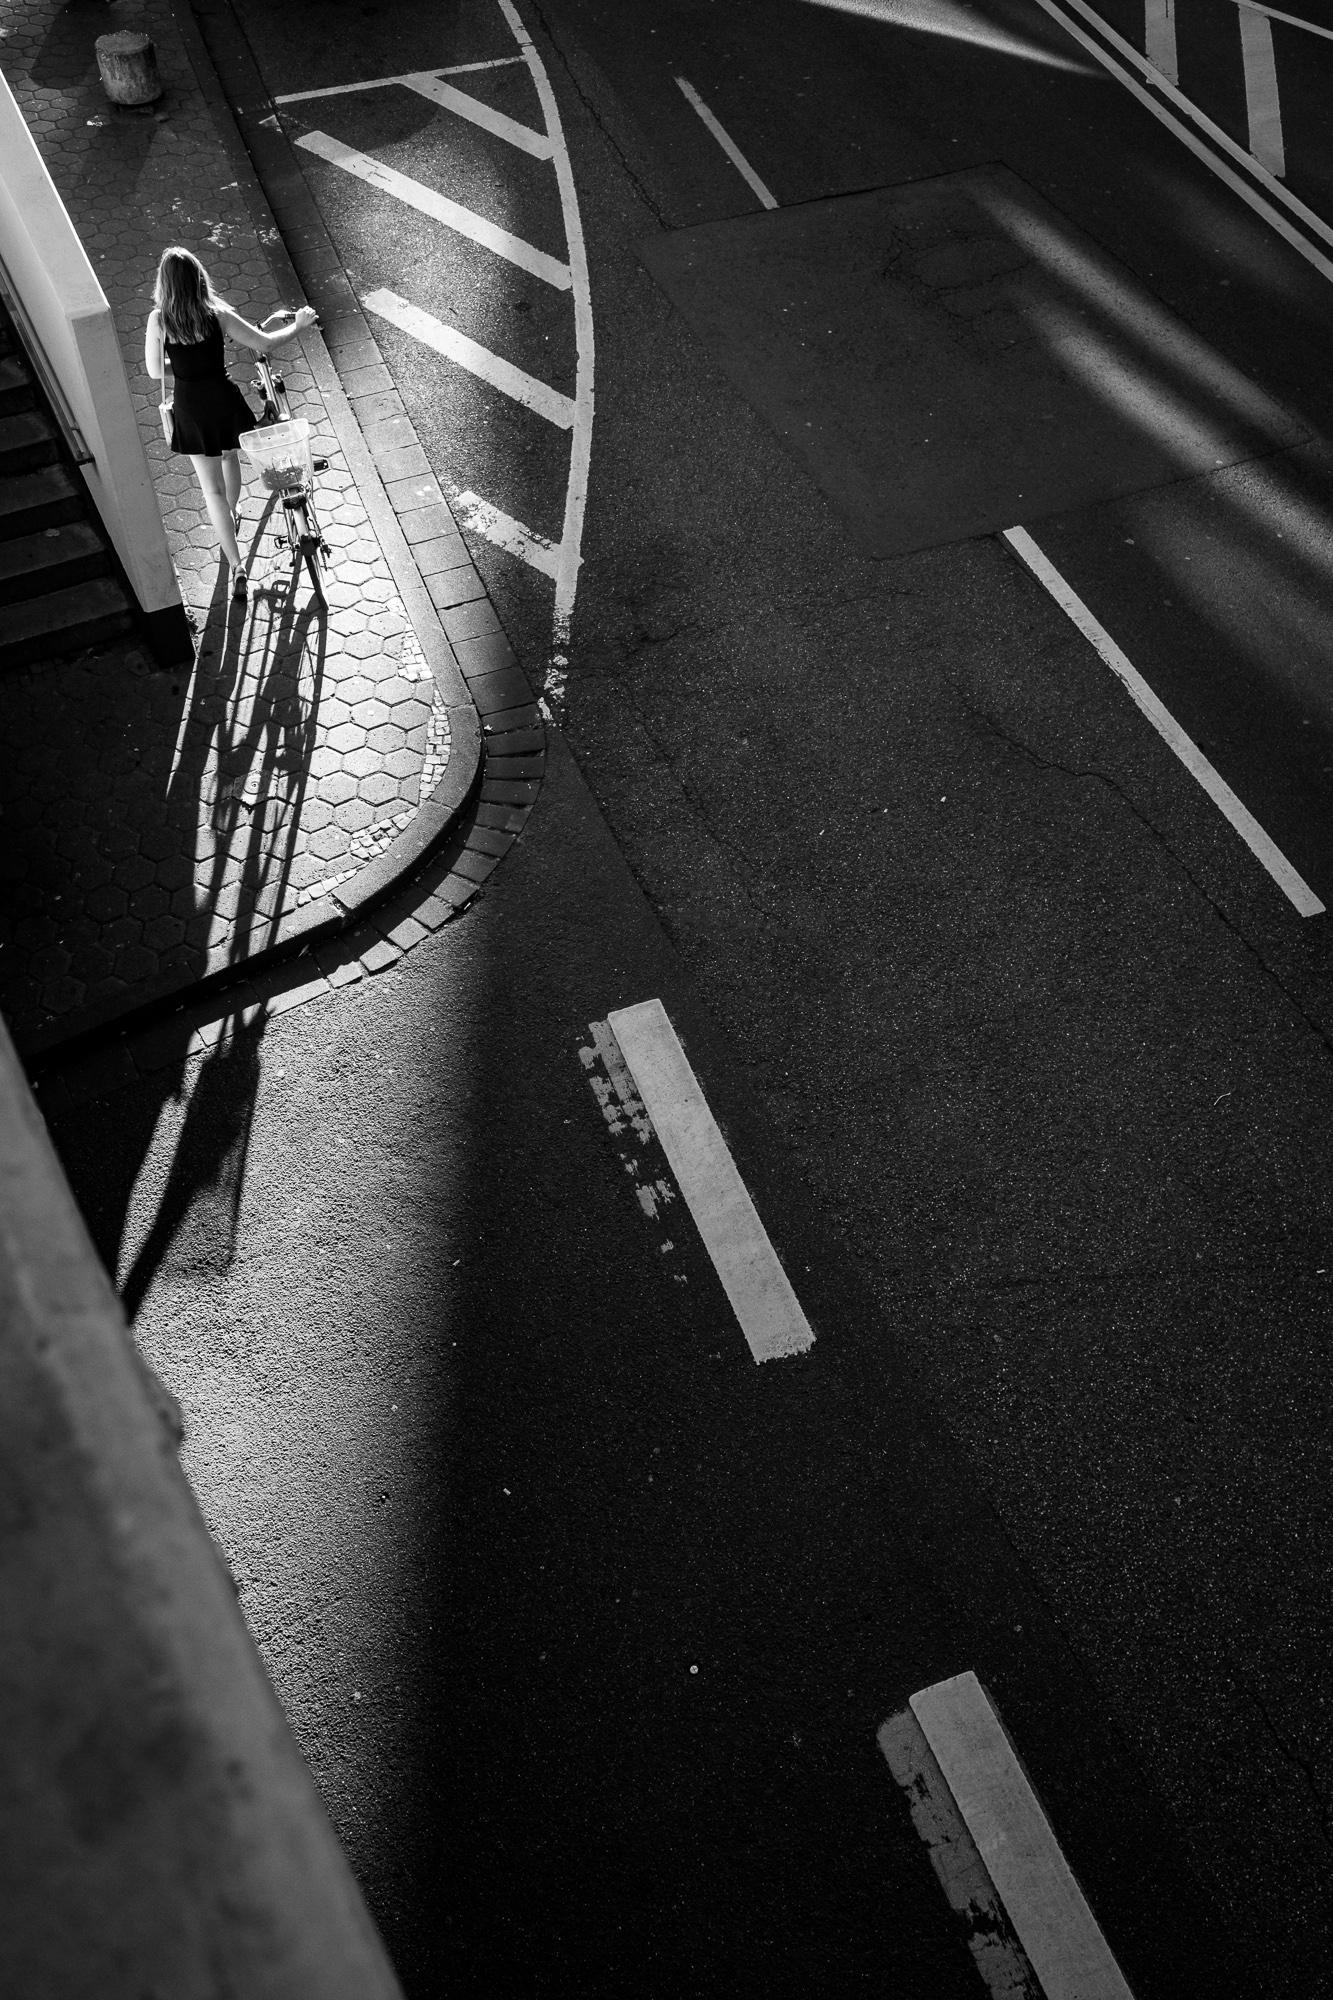 querformat-fotografie - Achim Katzberg - querformat-fotografie_MKG_VErnissage-031